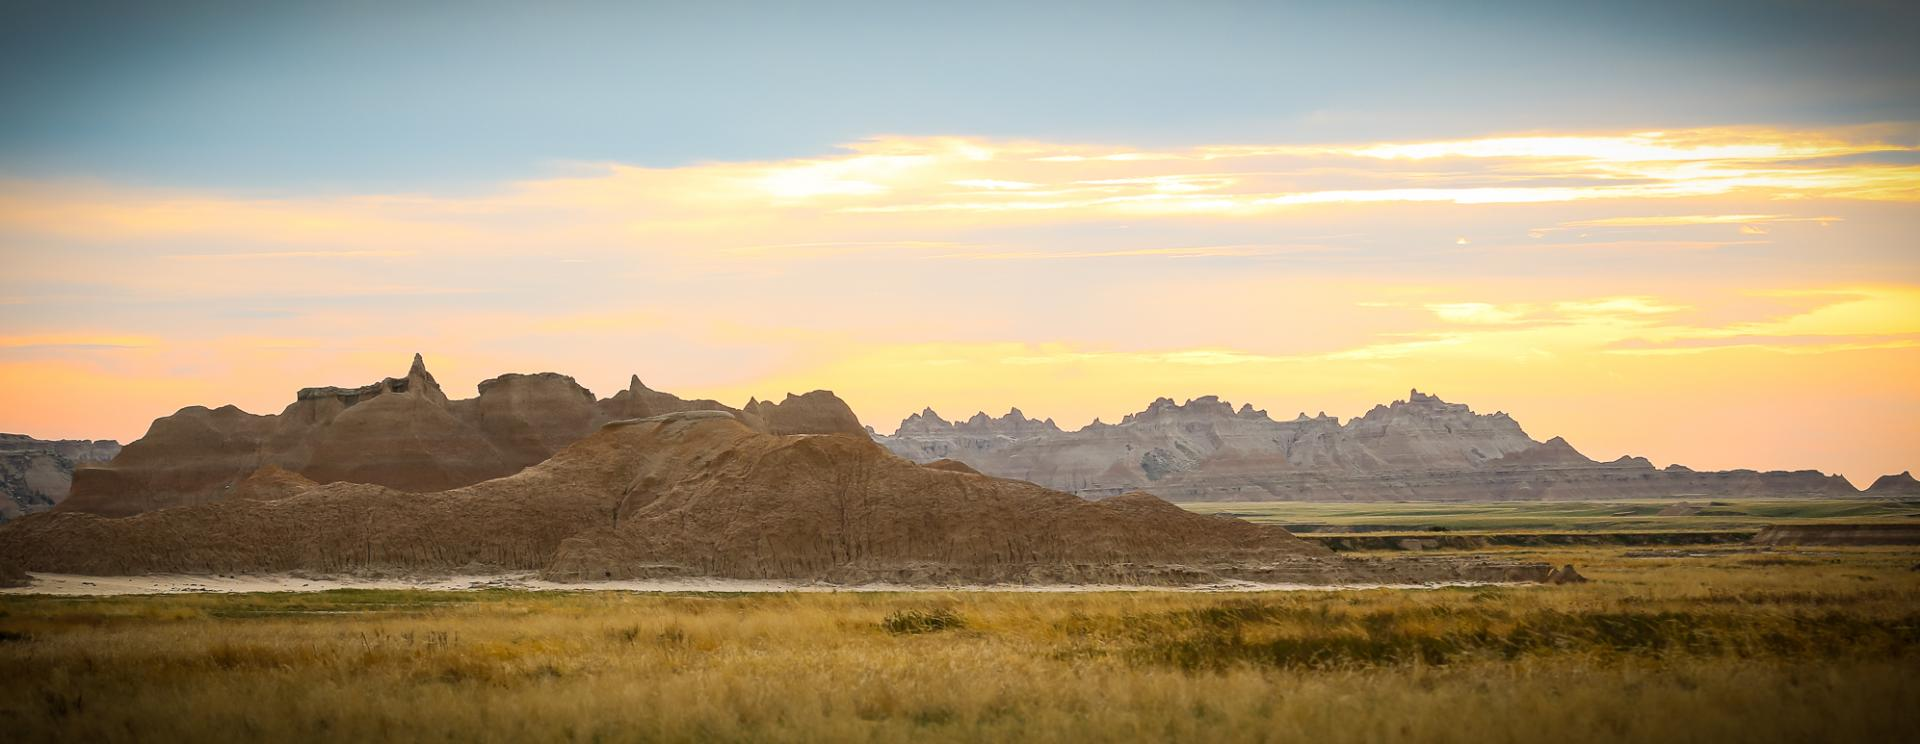 Badlands National Park | Photo by: Greg Valladolid